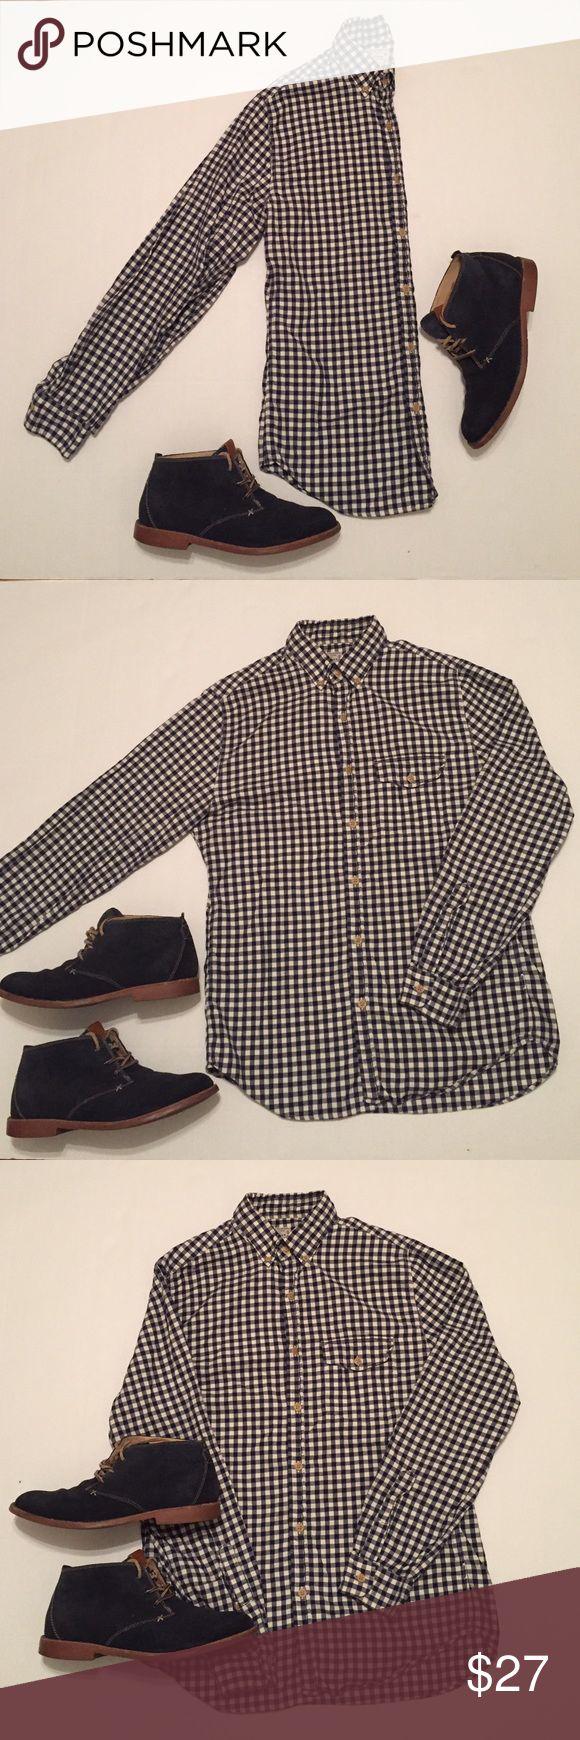 J. CREW  casual button down shirt NWOT.  Secret wash gingham pattern J. Crew Shirts Casual Button Down Shirts